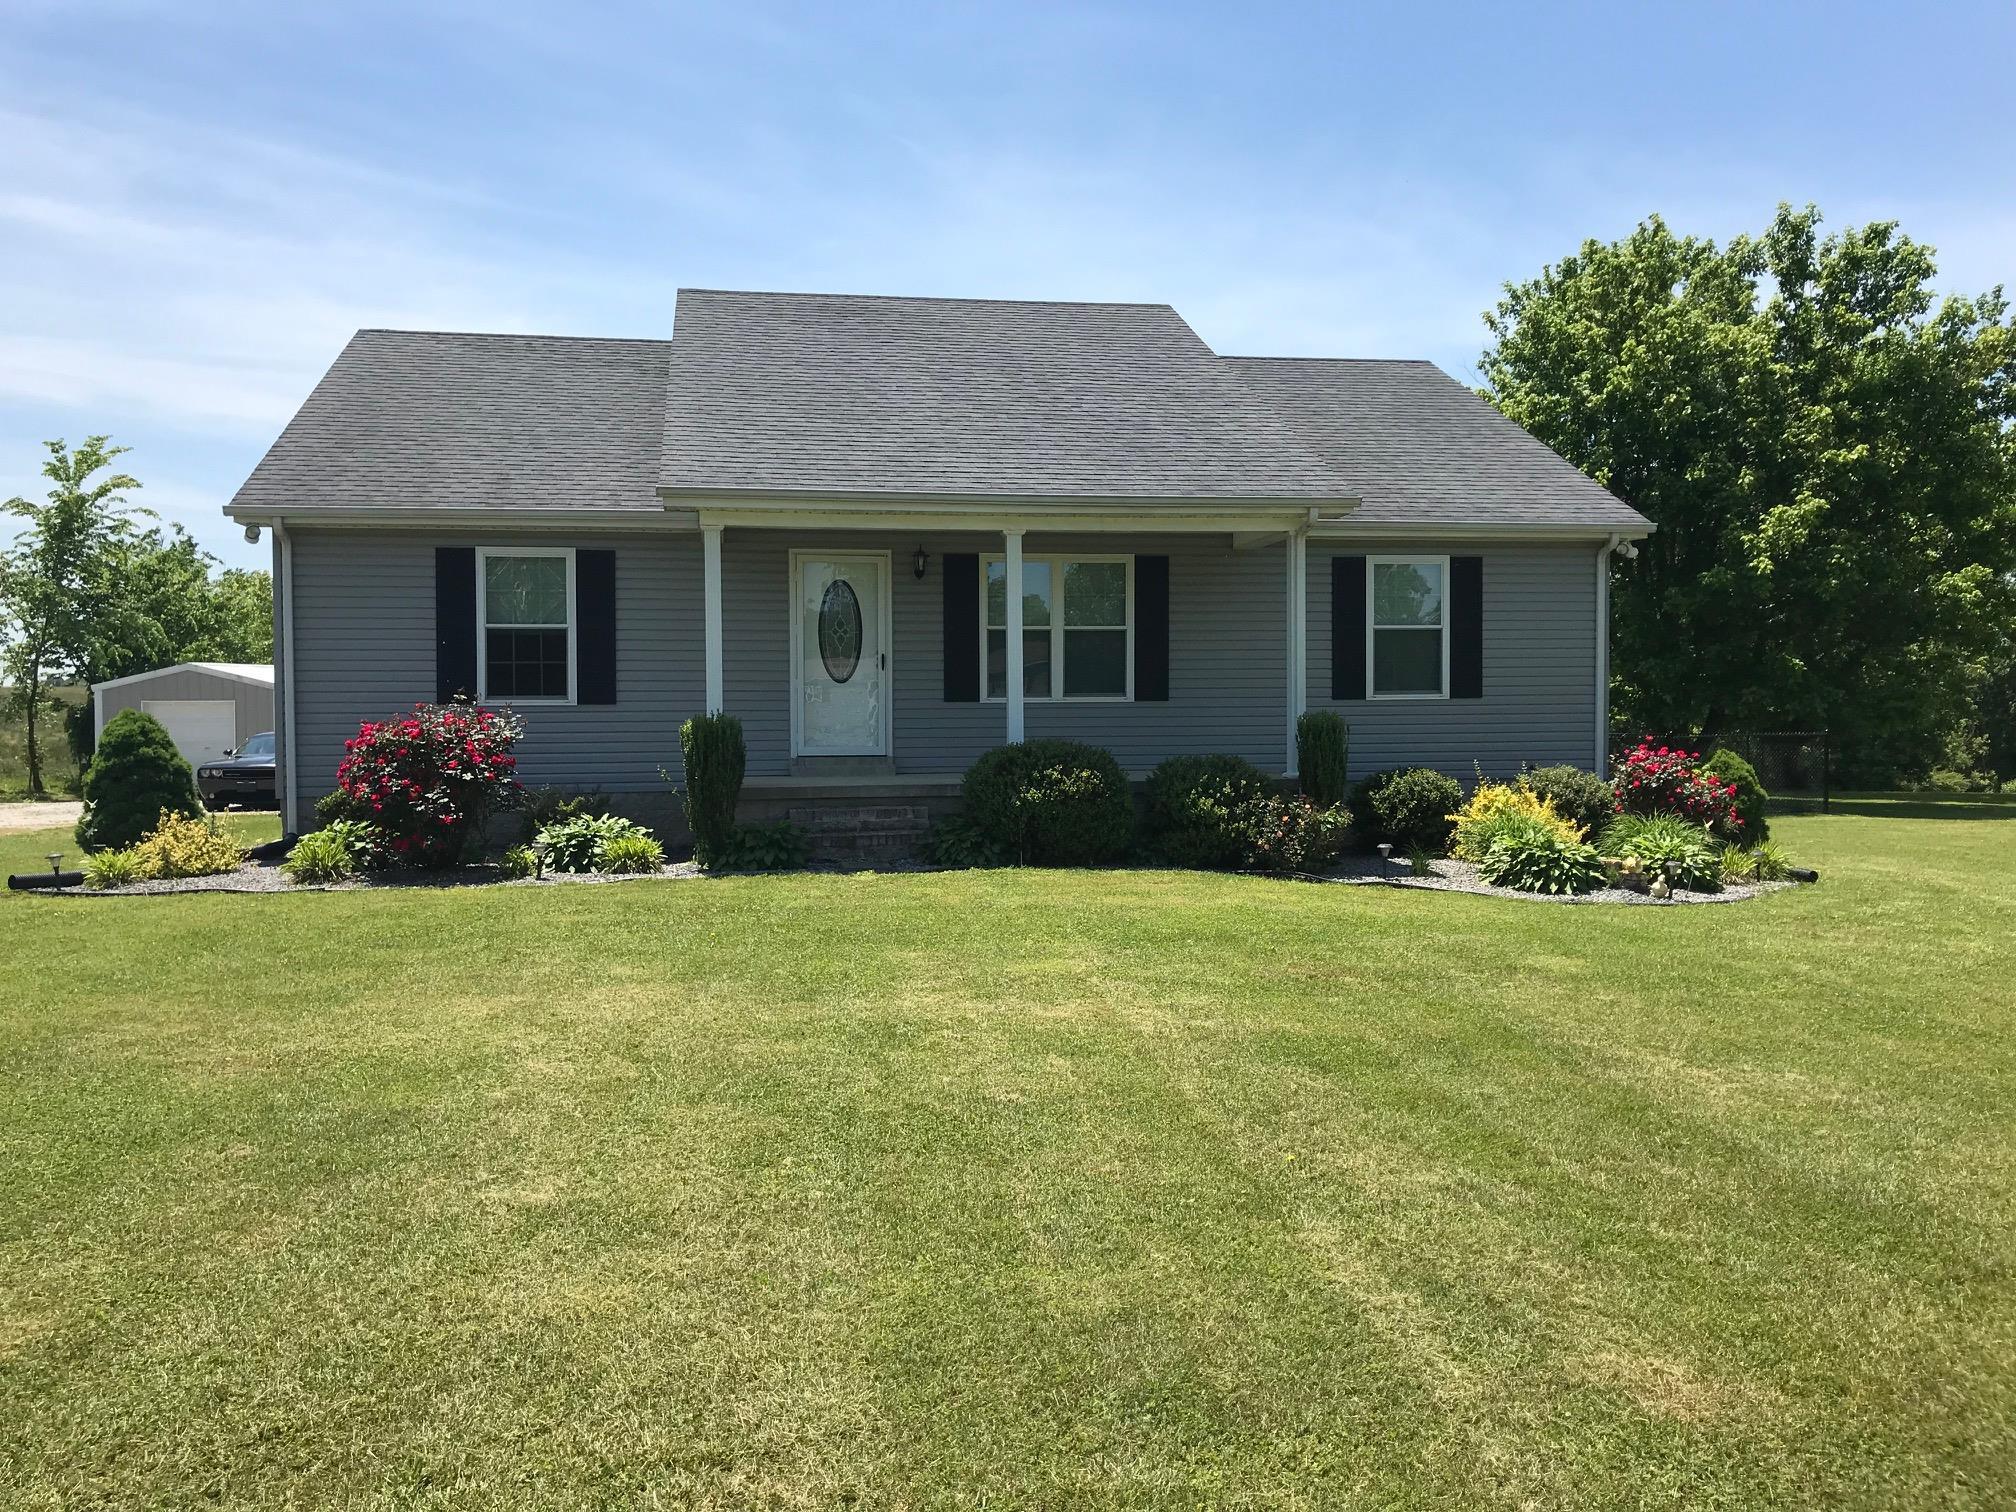 2202 Cave Hollow Rd, Lafayette, TN 37083 - Lafayette, TN real estate listing